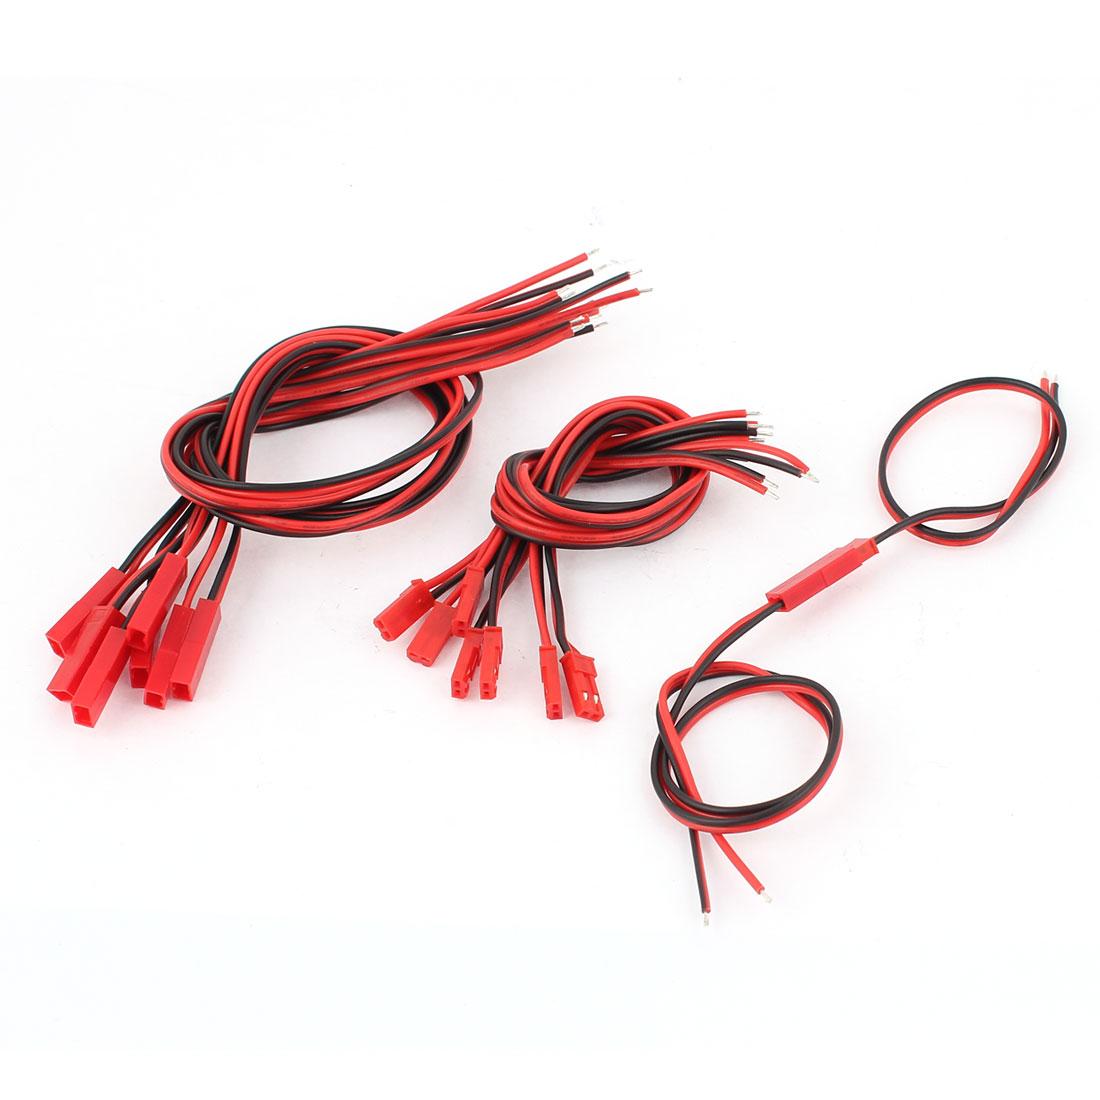 16pcs Male Female Connector JST Lead Socket Connector Cable Line